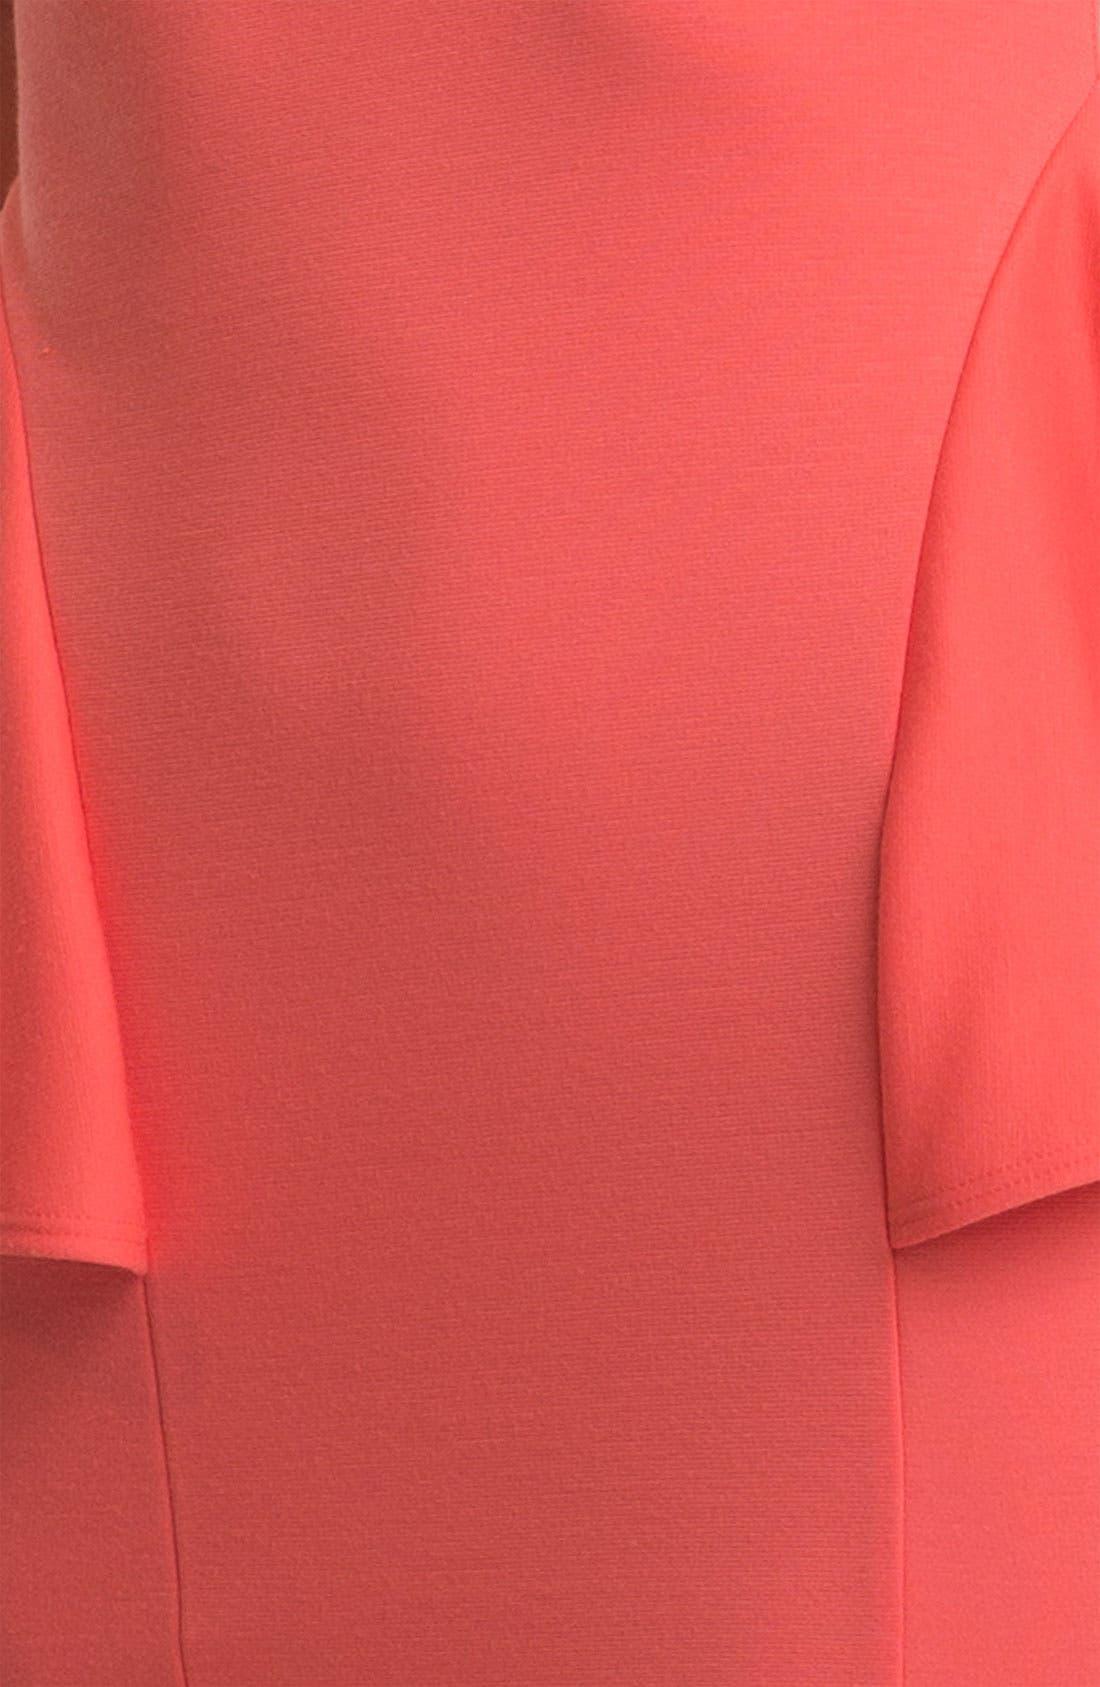 Alternate Image 3  - Soprano Lace Panel Peplum Minidress (Juniors)